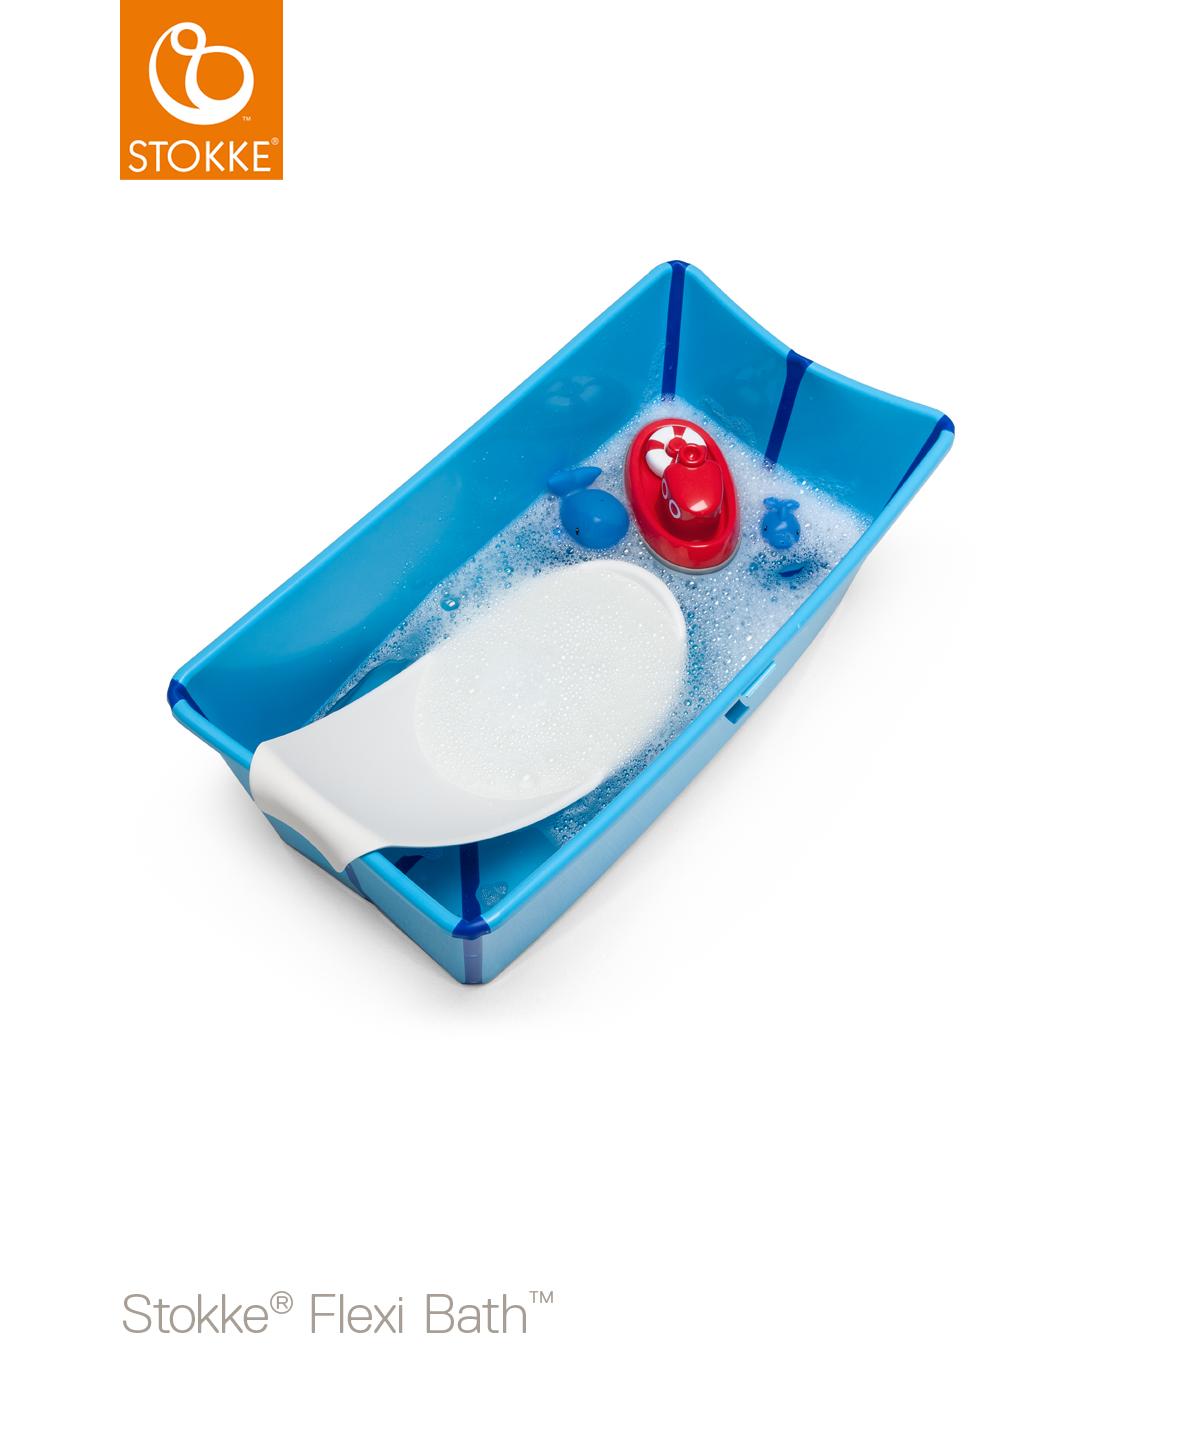 Stokke Flexi Bath Newborn Insert - Kids Emporium